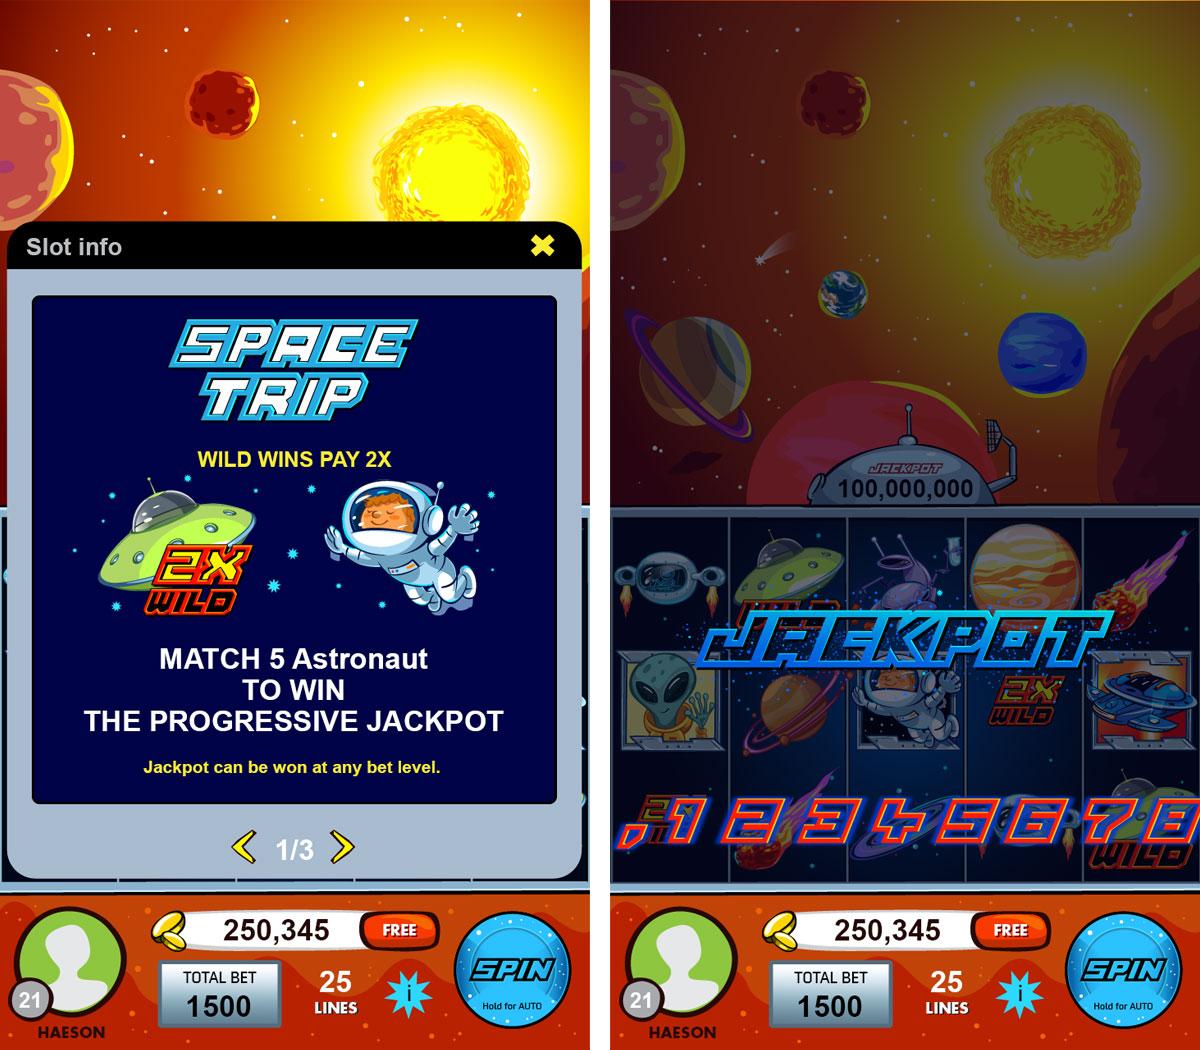 space_trip_blog_info